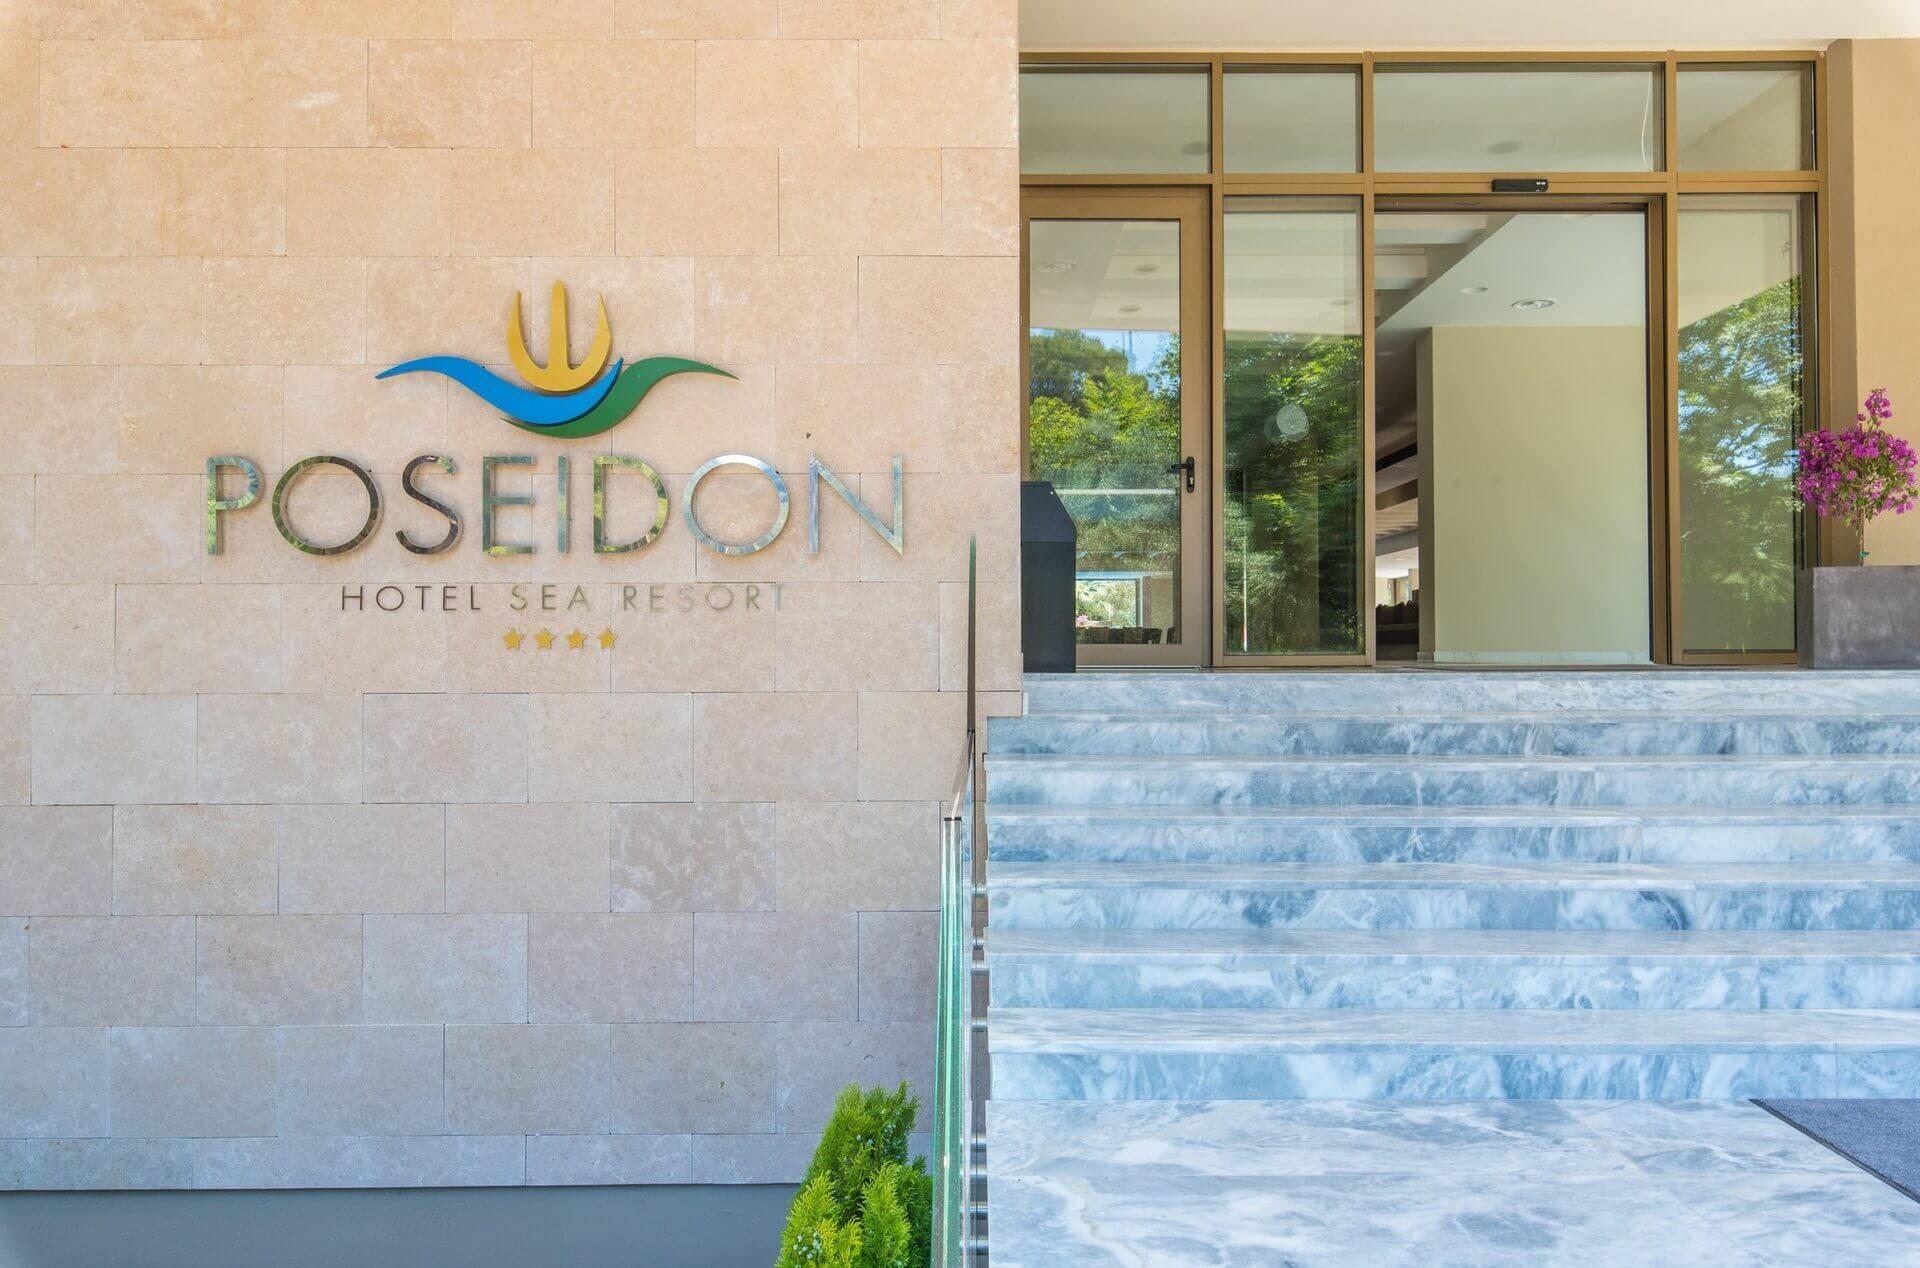 Poseidon Hotel Sea Resort - вход